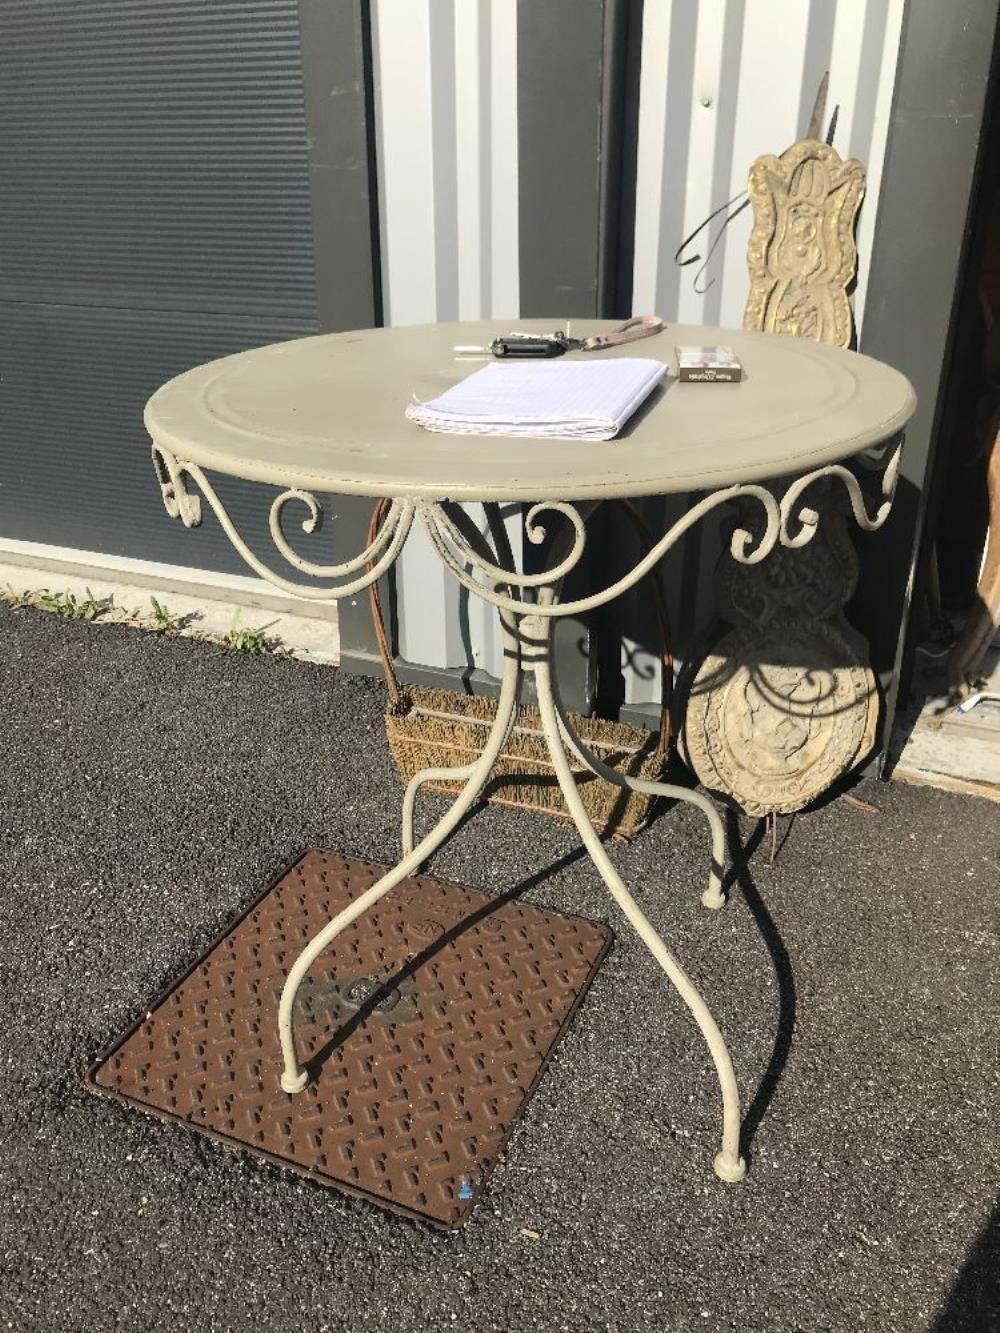 TABLE DE JARDIN METAL GRIS occasion - Destock et Broc